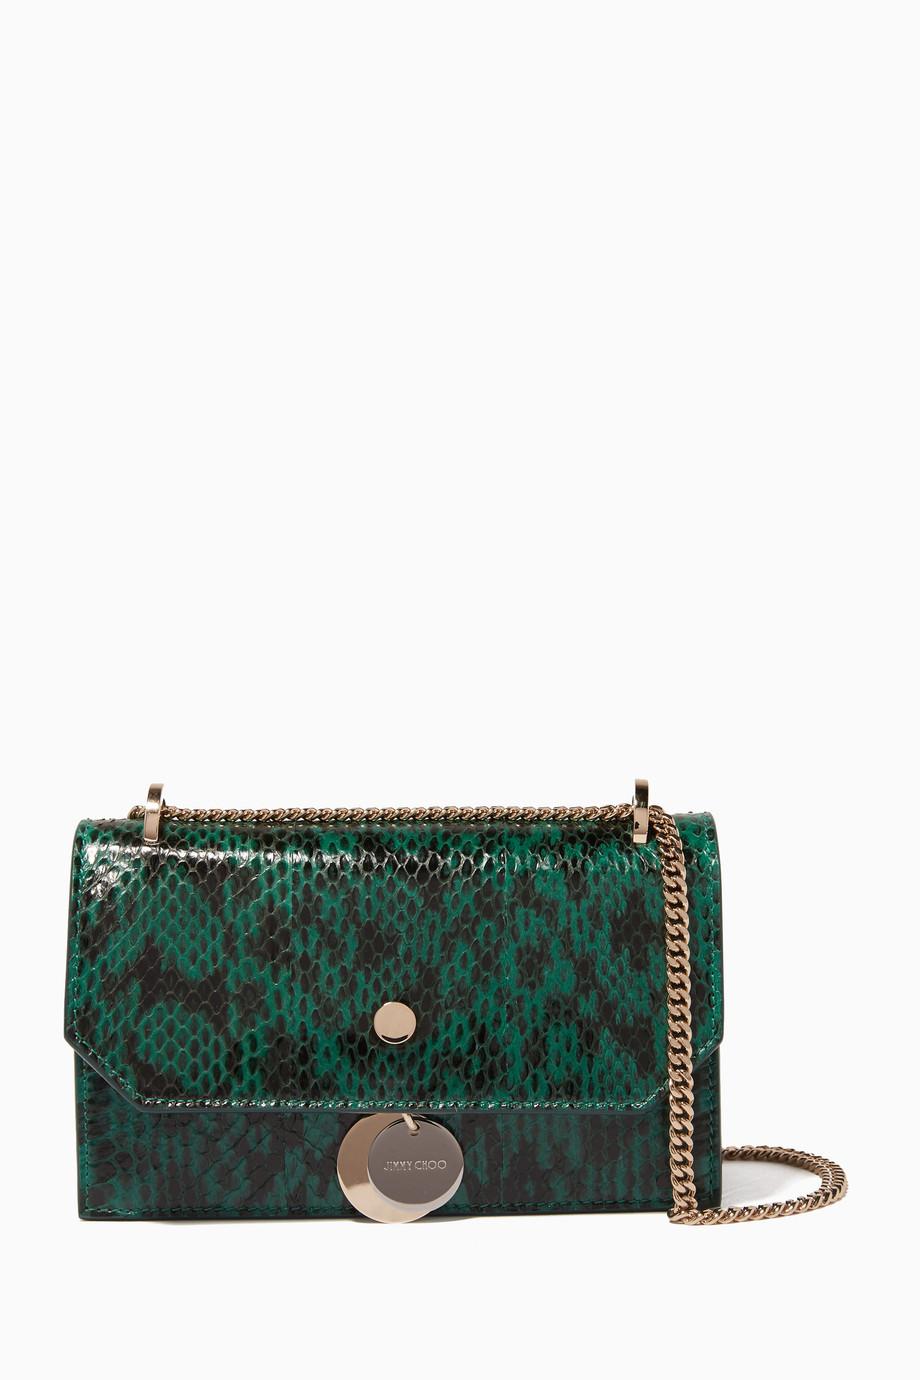 2cb9dcd6566 Shop Jimmy Choo Green Emerald-Green Mini Elaphe Finley Shoulder Bag ...